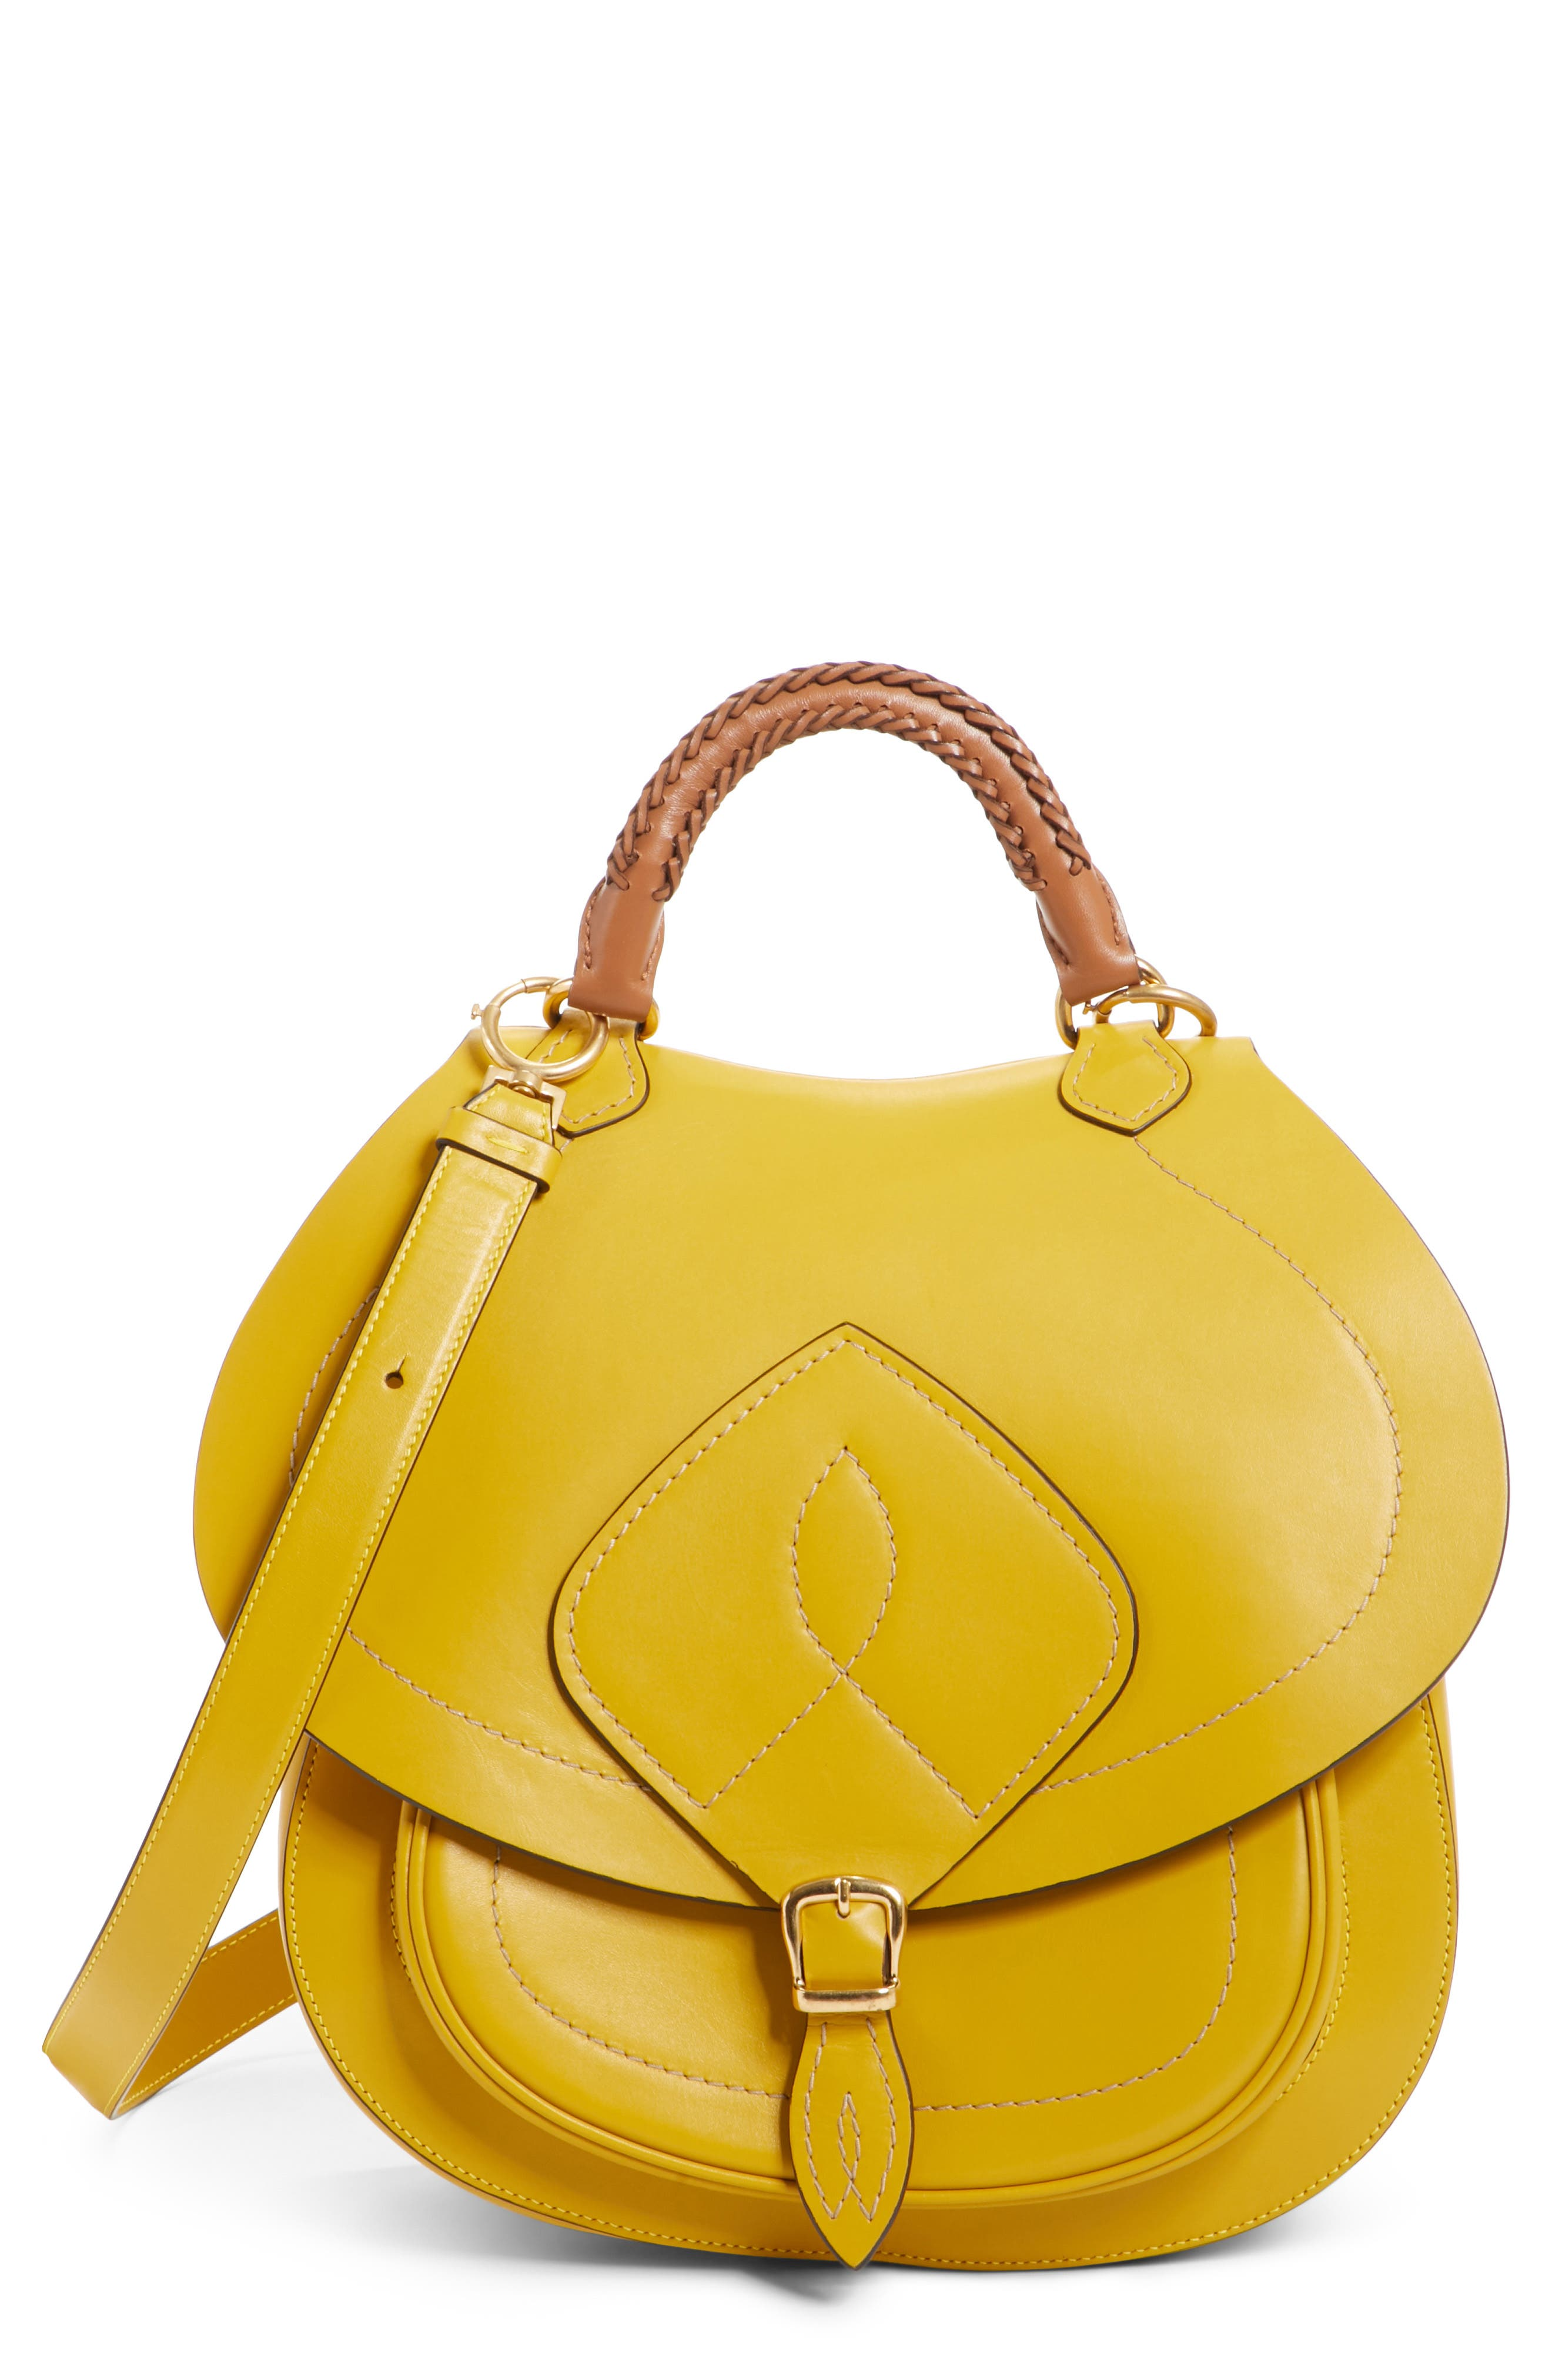 Alternate Image 1 Selected - Maison Margiela Large Bag Slide Leather Saddle Bag